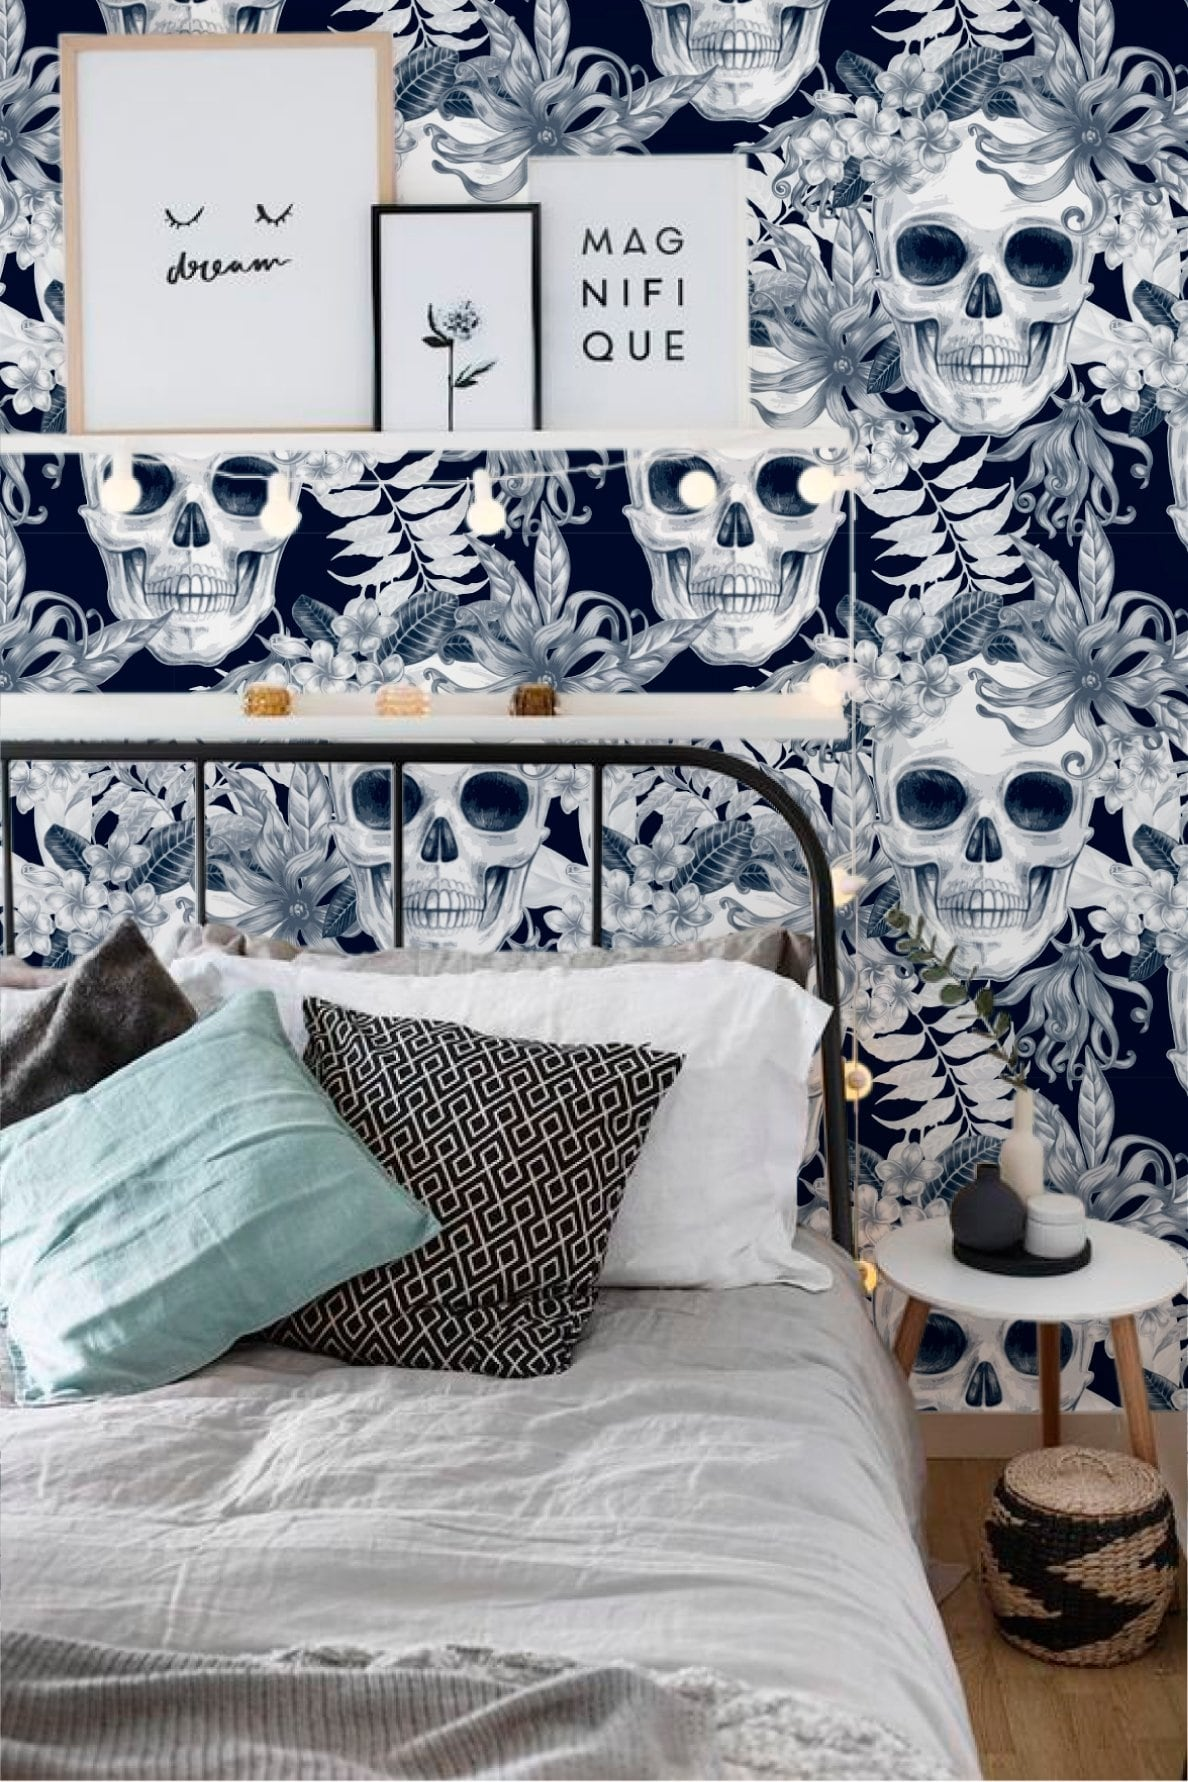 Skull flowers wallpaper for a unique interior